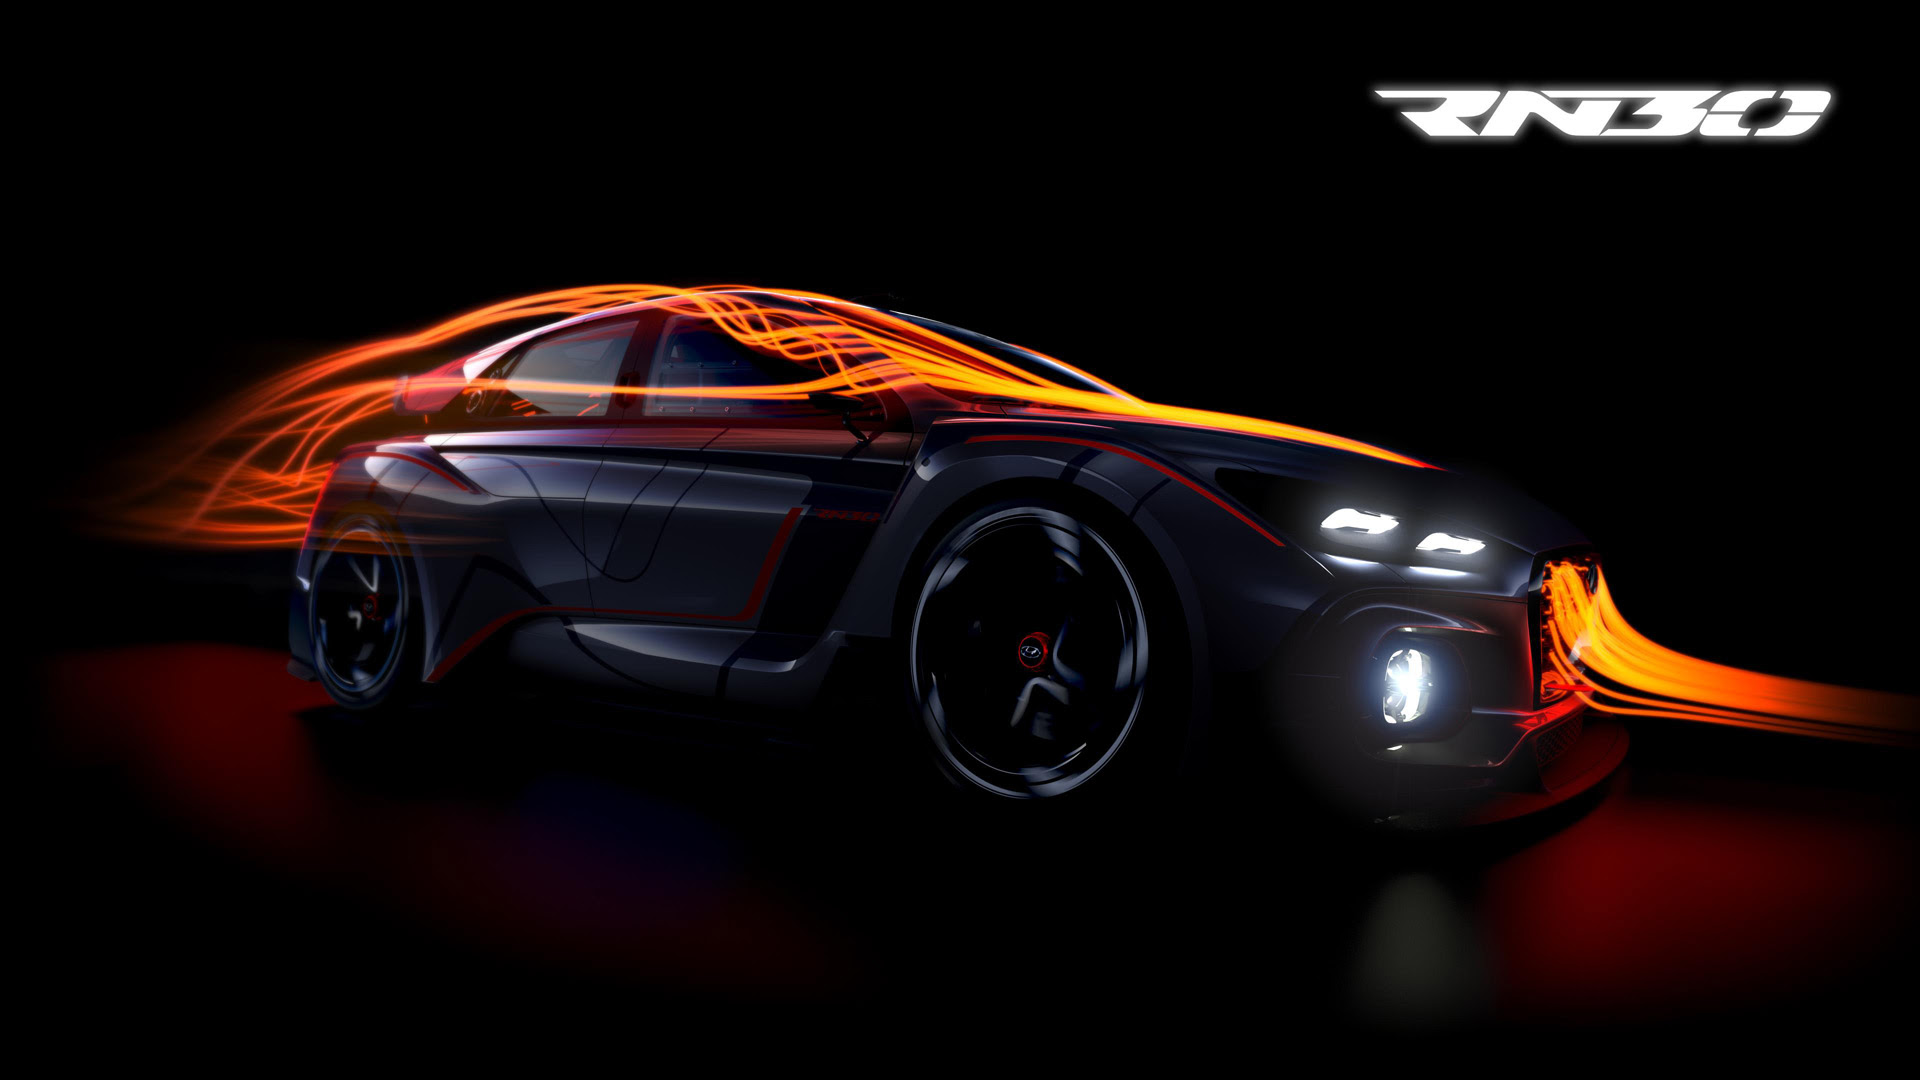 New concept previews Hyundai i30 N hot hatch